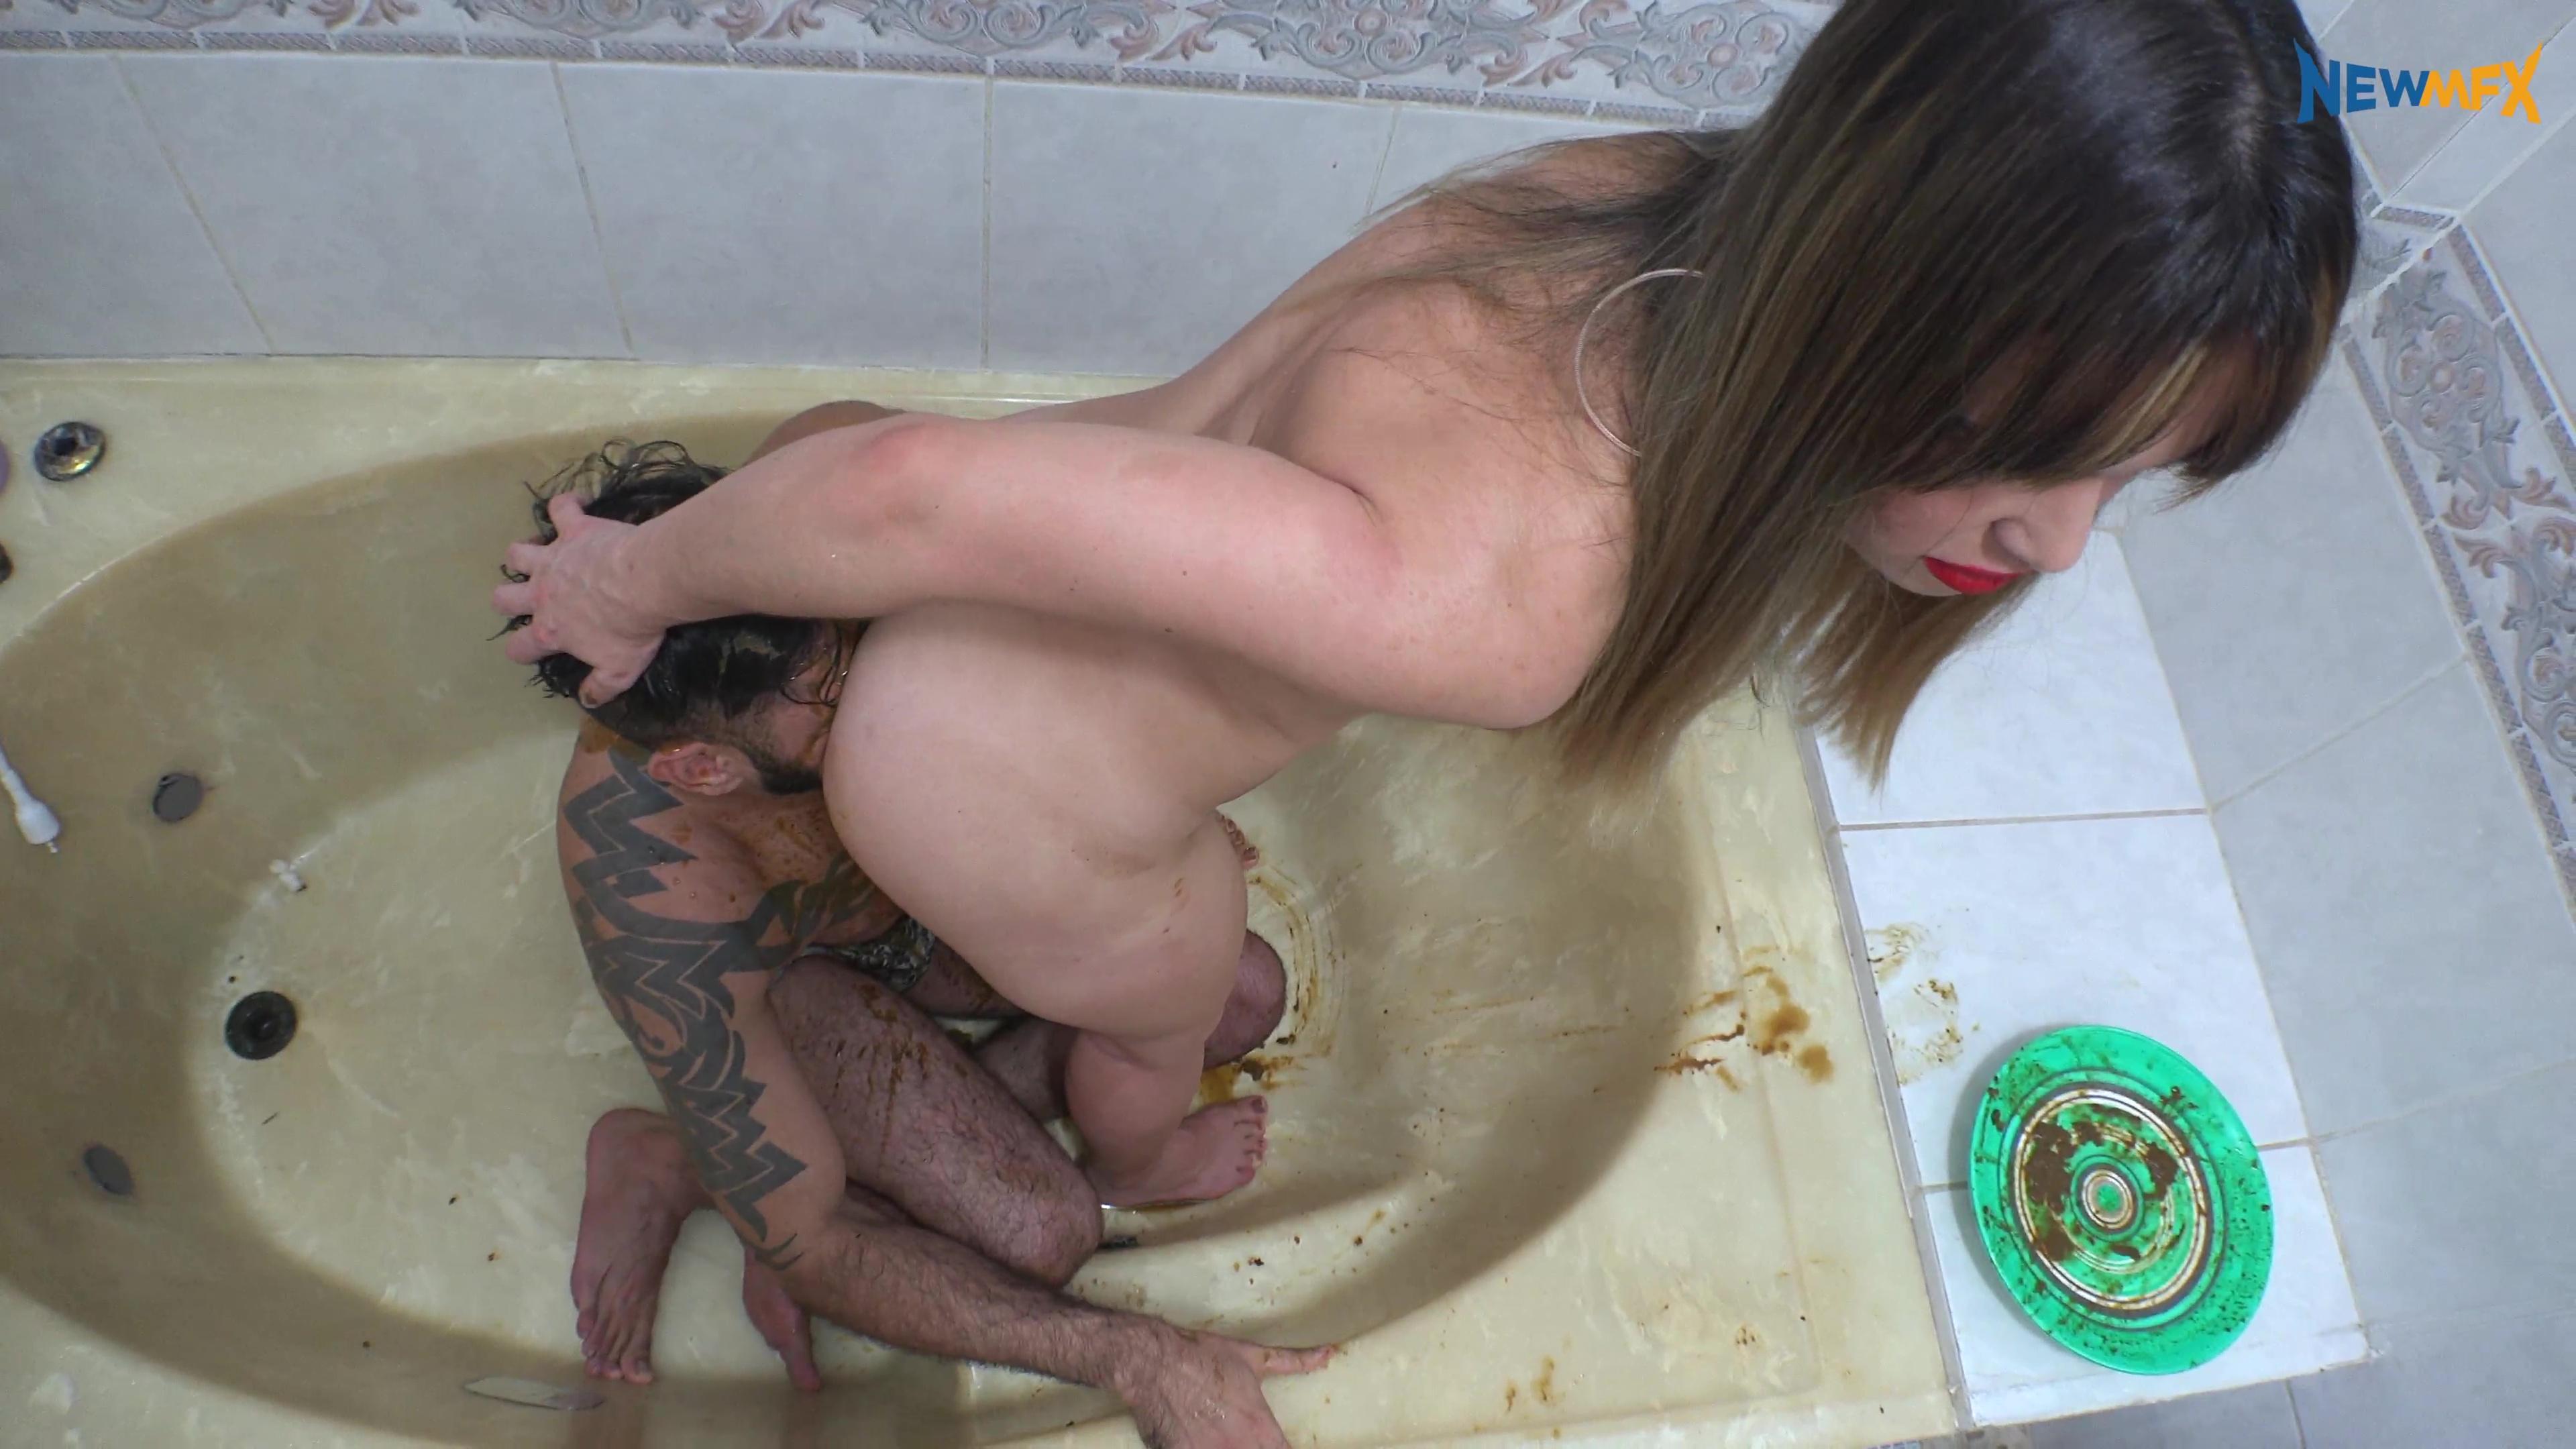 NewScatinBrazil - Messy in the bathroom